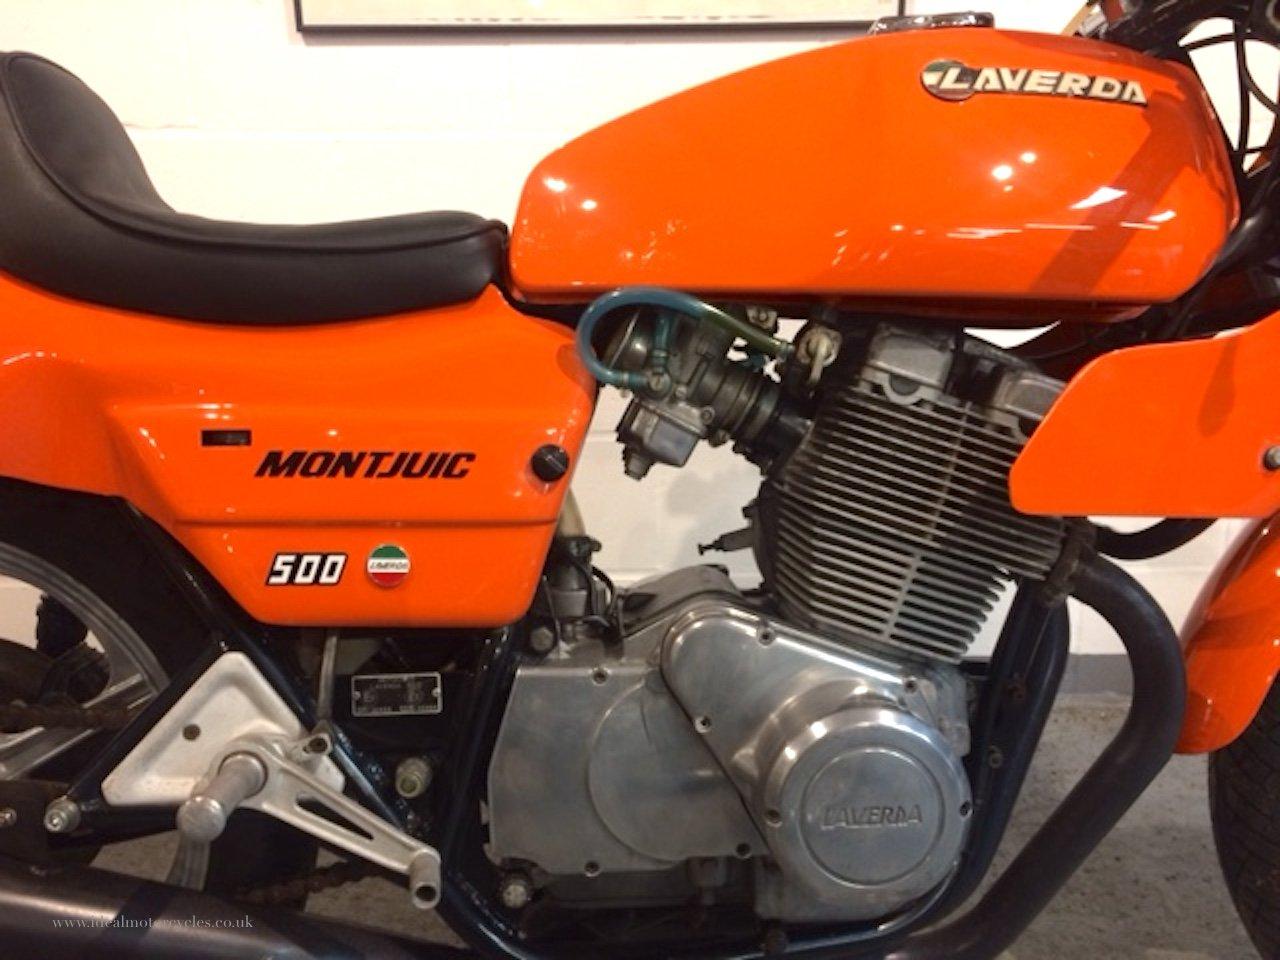 1982 Laverda Montjuic 500cc Twin Mk2 For Sale (picture 3 of 6)